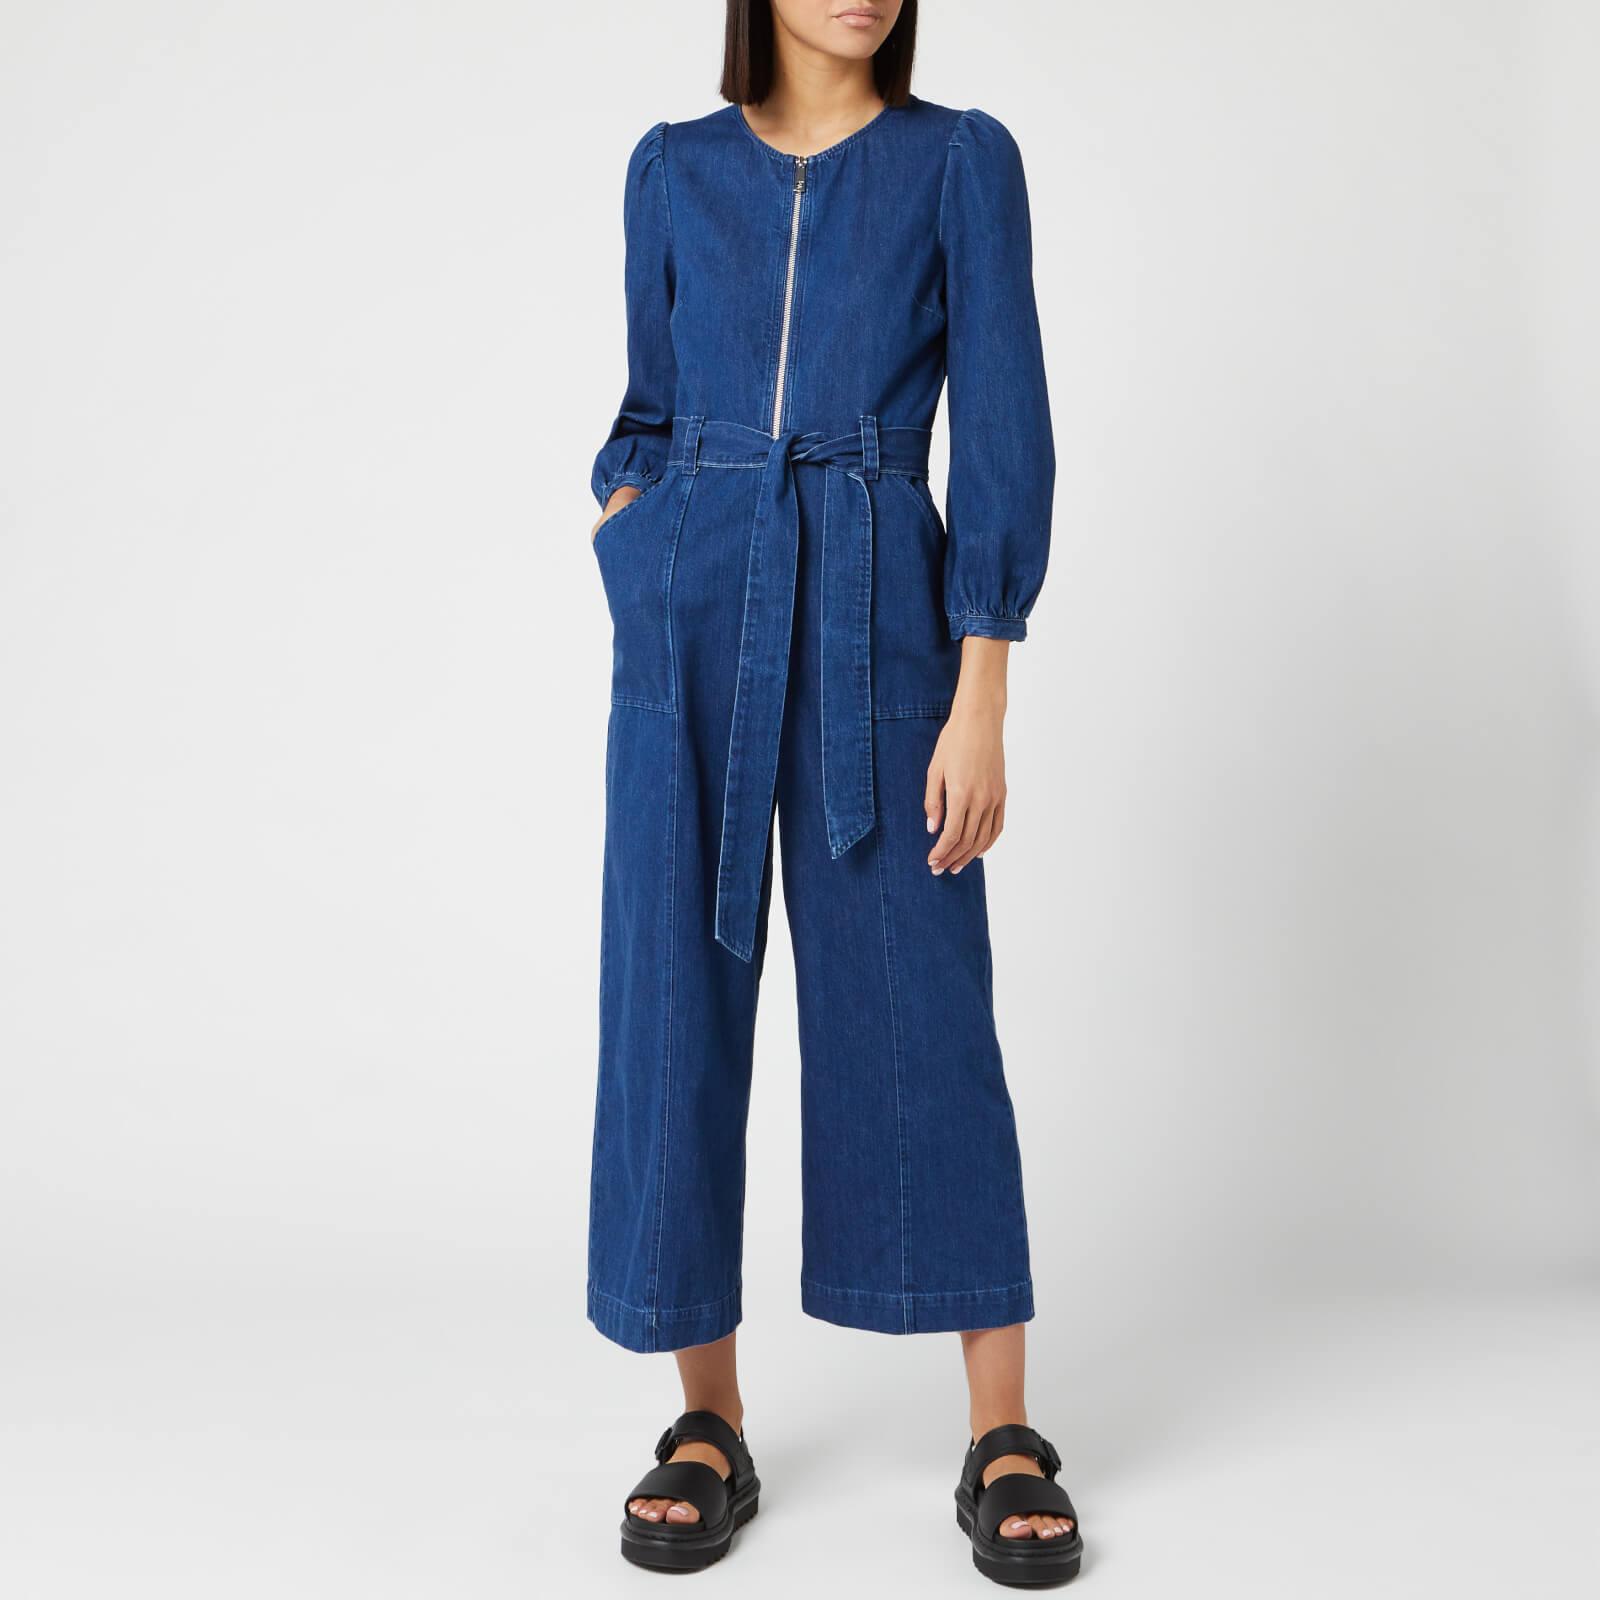 Whistles Women's Estelle Denim Jumpsuit - Blue - UK 10